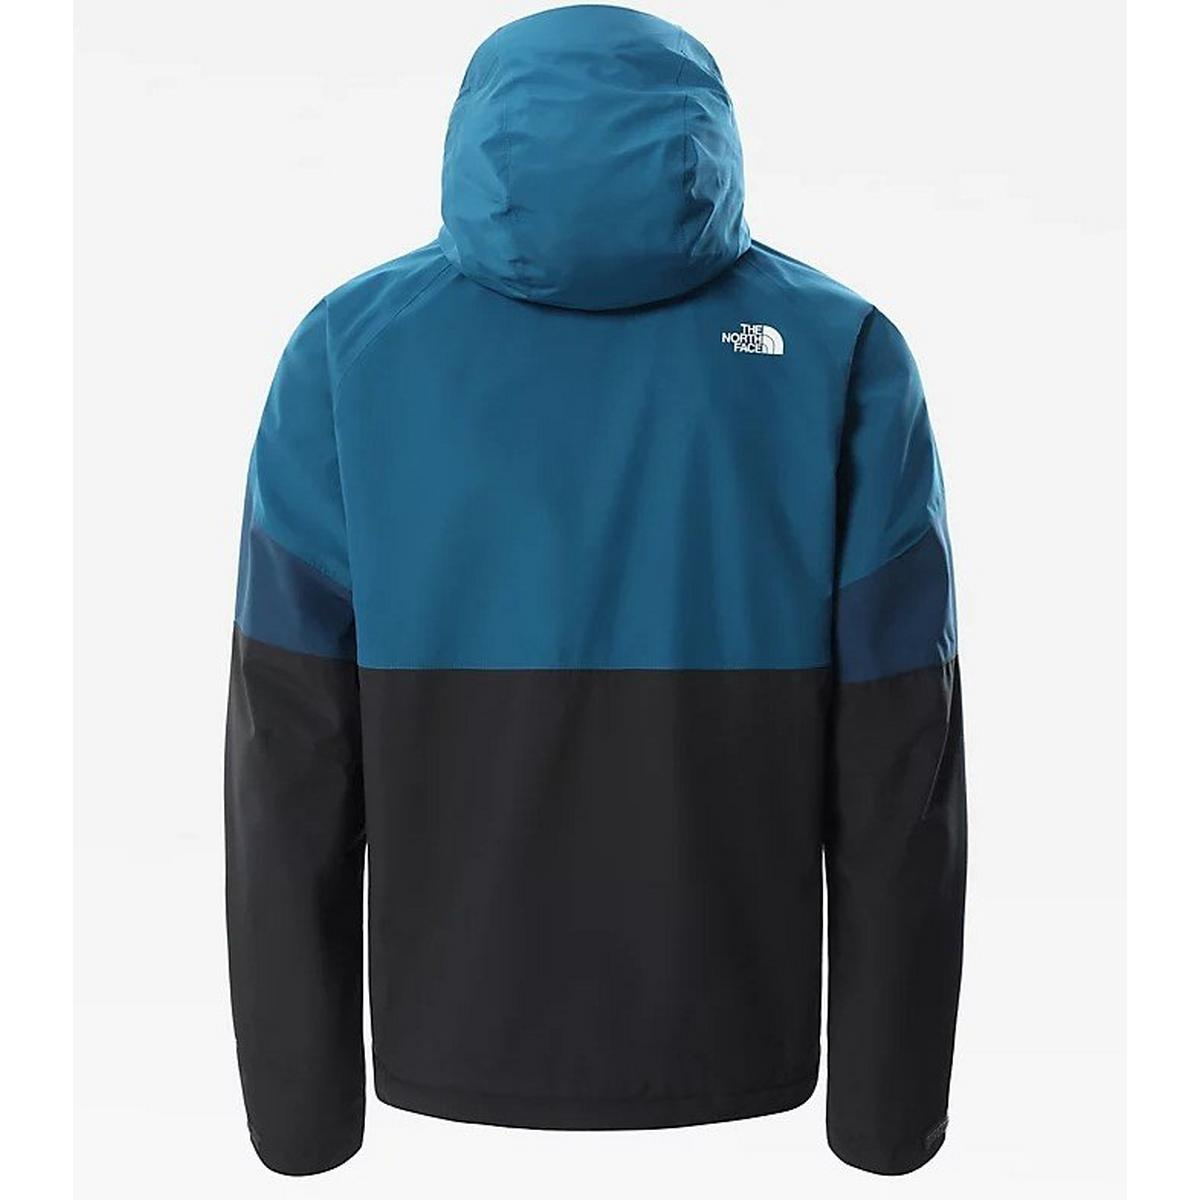 The North Face Men's Lightning Jacket - Blue